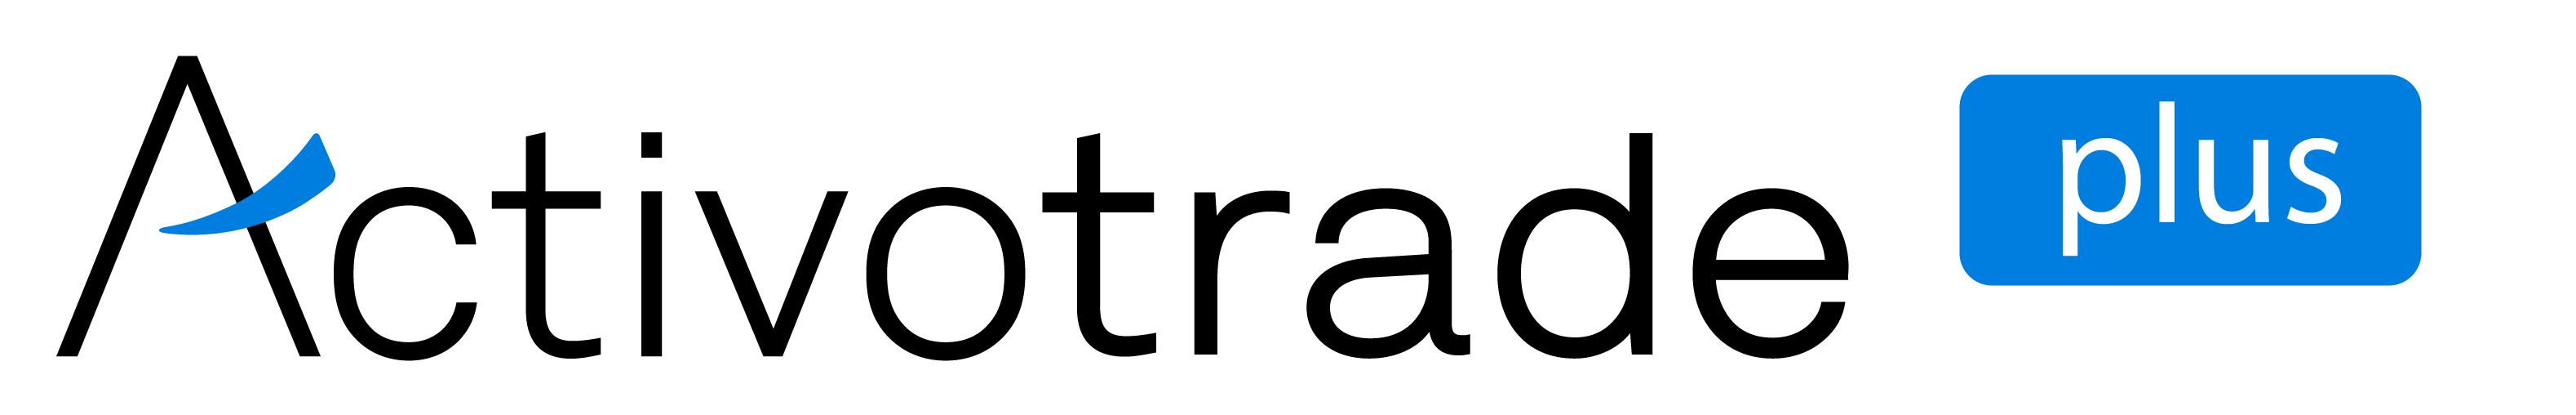 https://www.activotrade.com/assets/img/at_plus_logo.png?at_token=188a8cfc87fbc756c11e Fbc